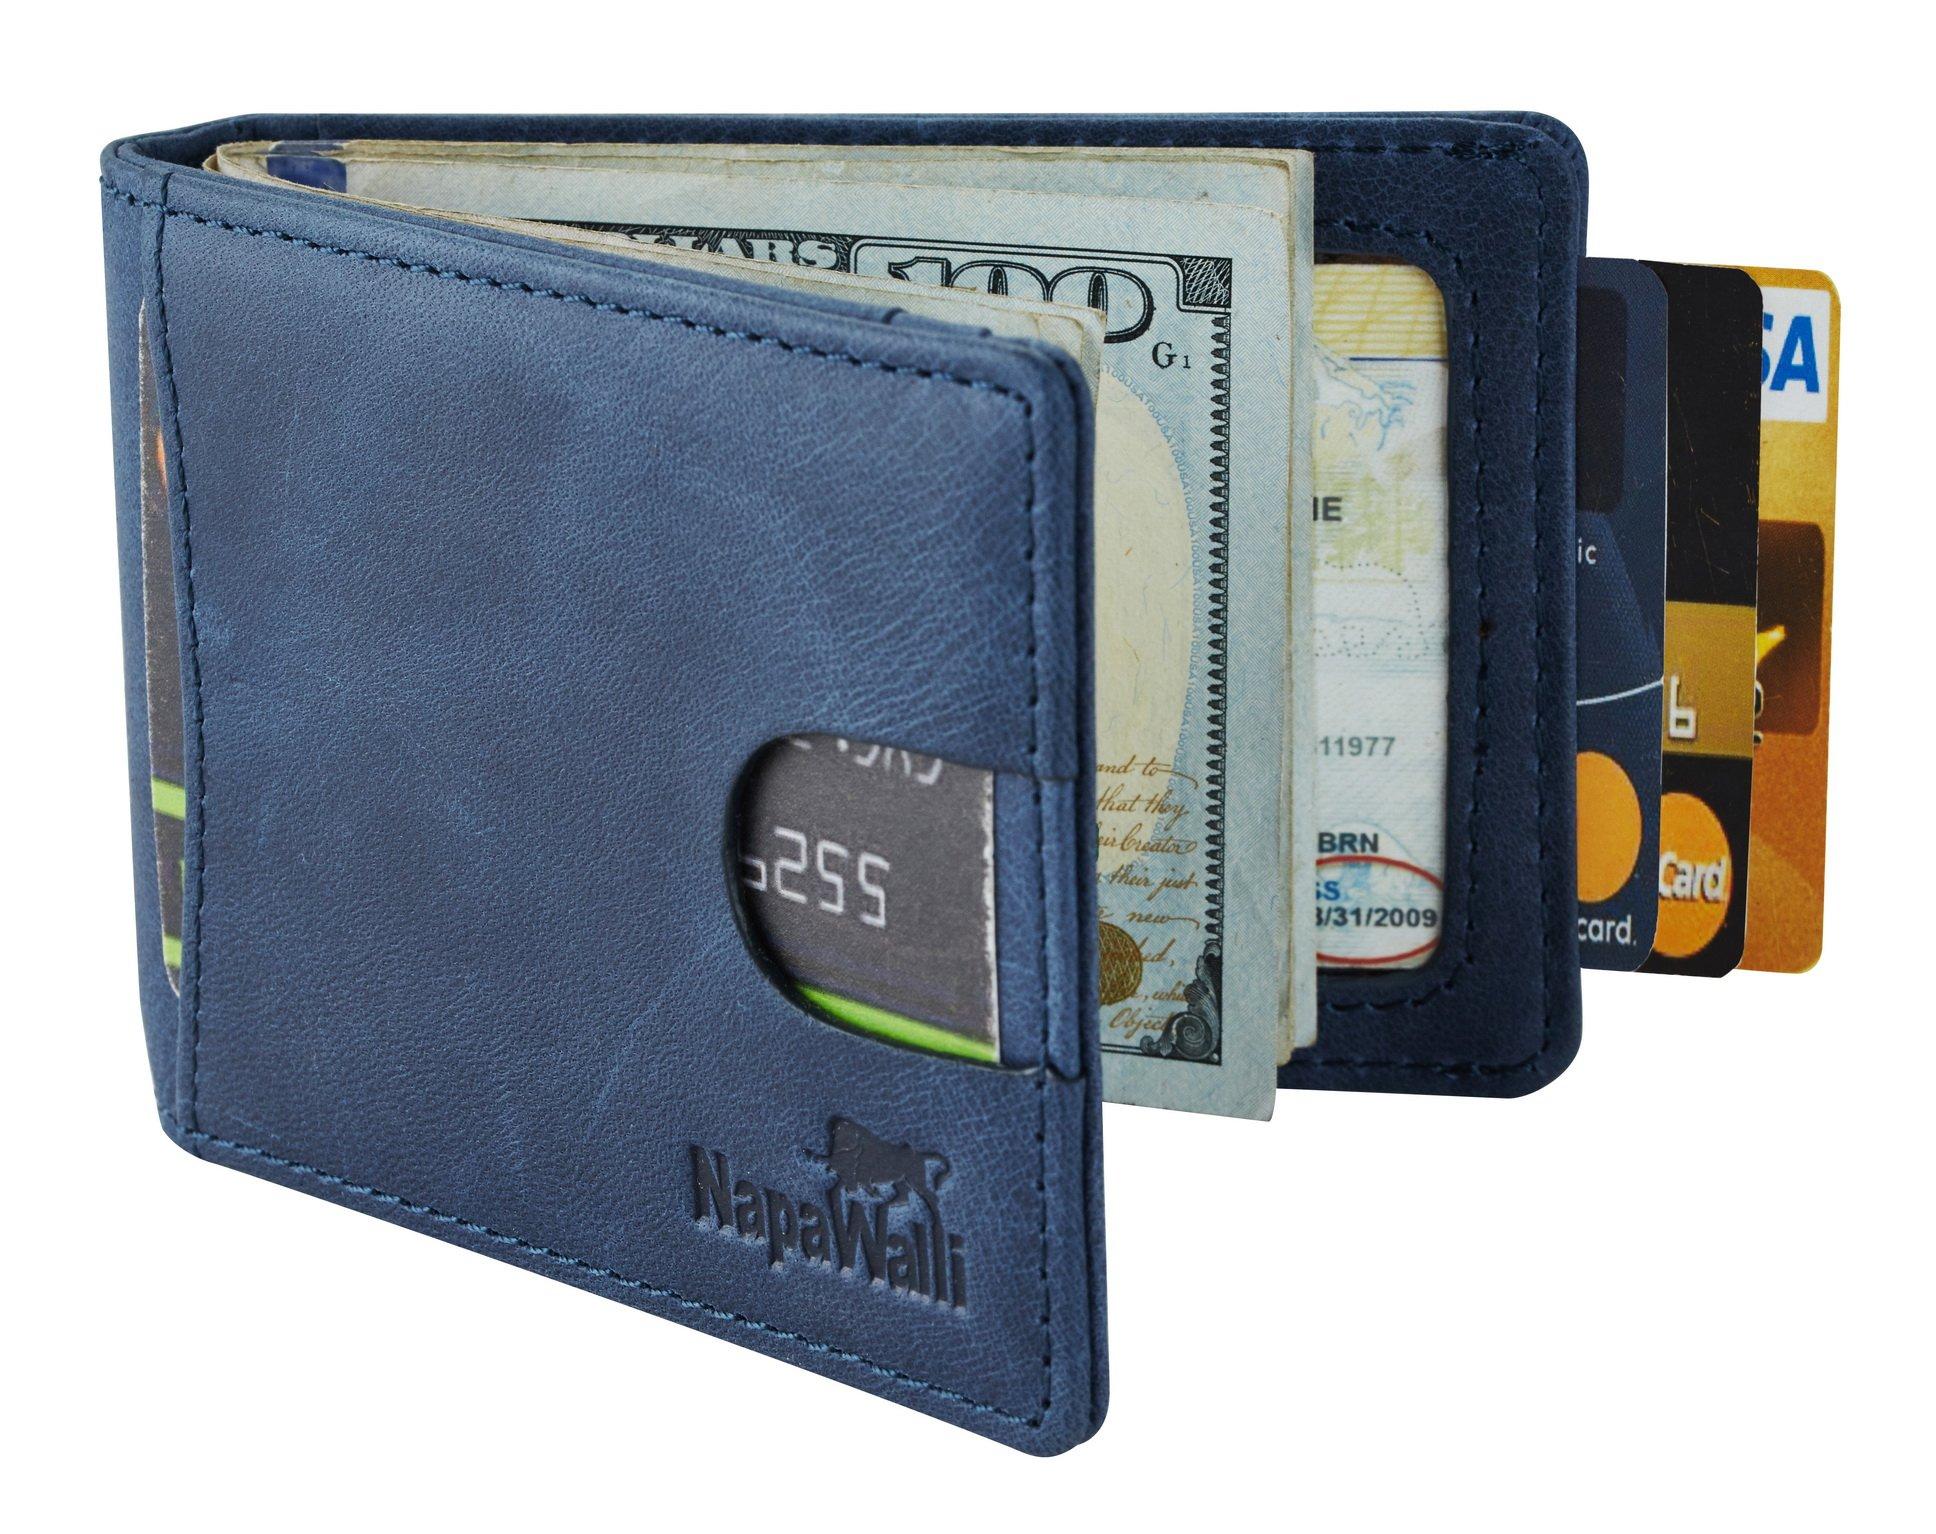 NapaWalli RFID Blocking Bifold Slim Genuine Leather Thin Minimalist Front Pocket Wallets for Men Money Clip (vintage deep blue)